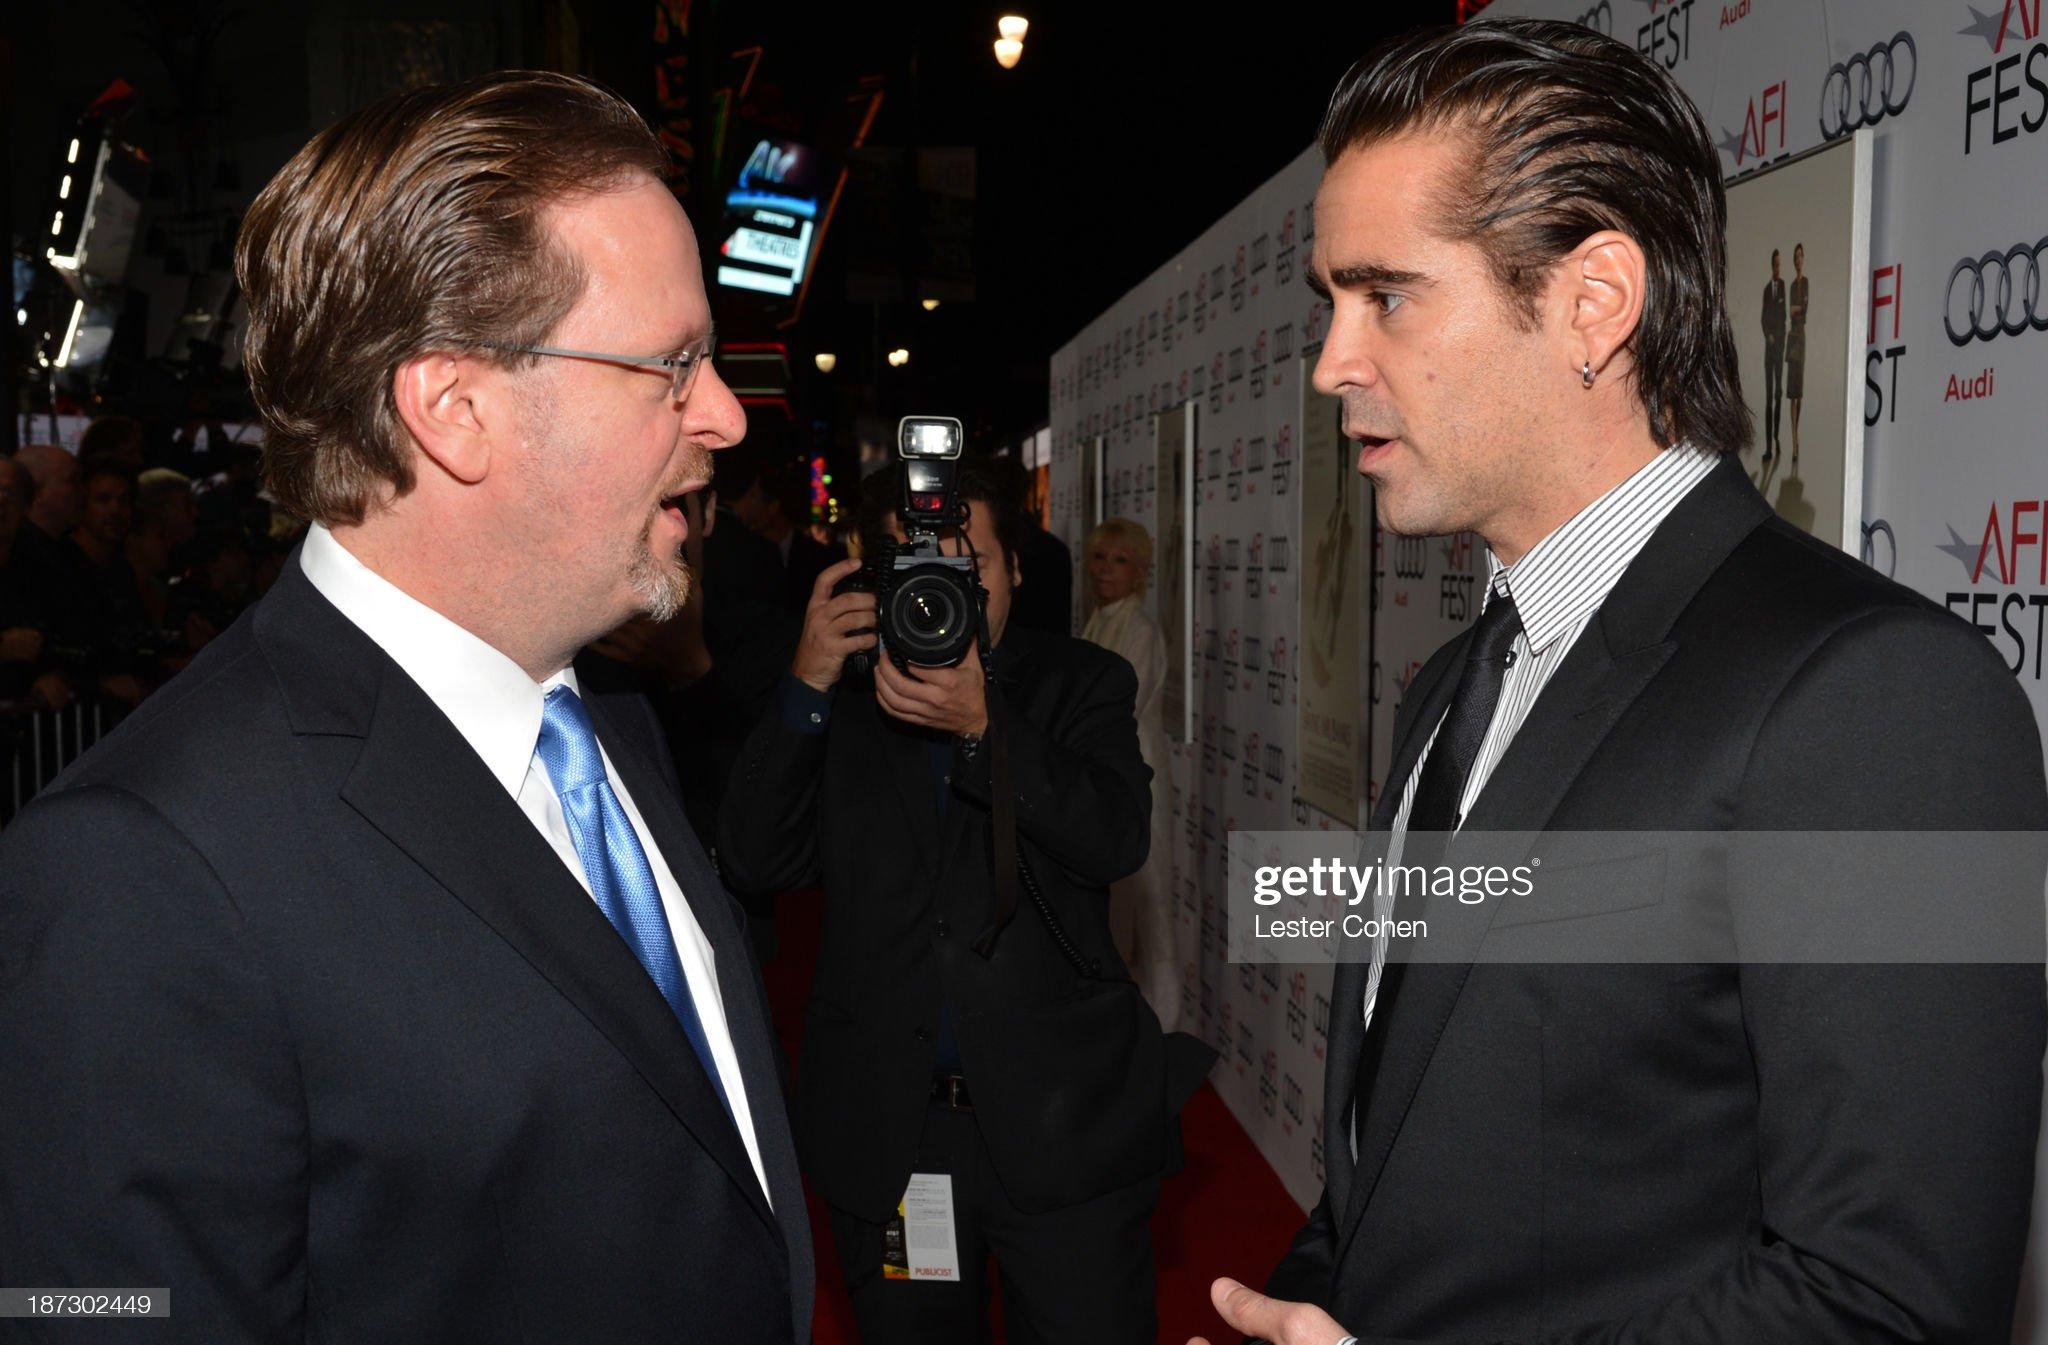 ¿Cuánto mide Colin Farrell? - Altura - Real height President-ceo-bob-gazzale-and-actor-colin-farrell-attend-the-premiere-picture-id187302449?s=2048x2048